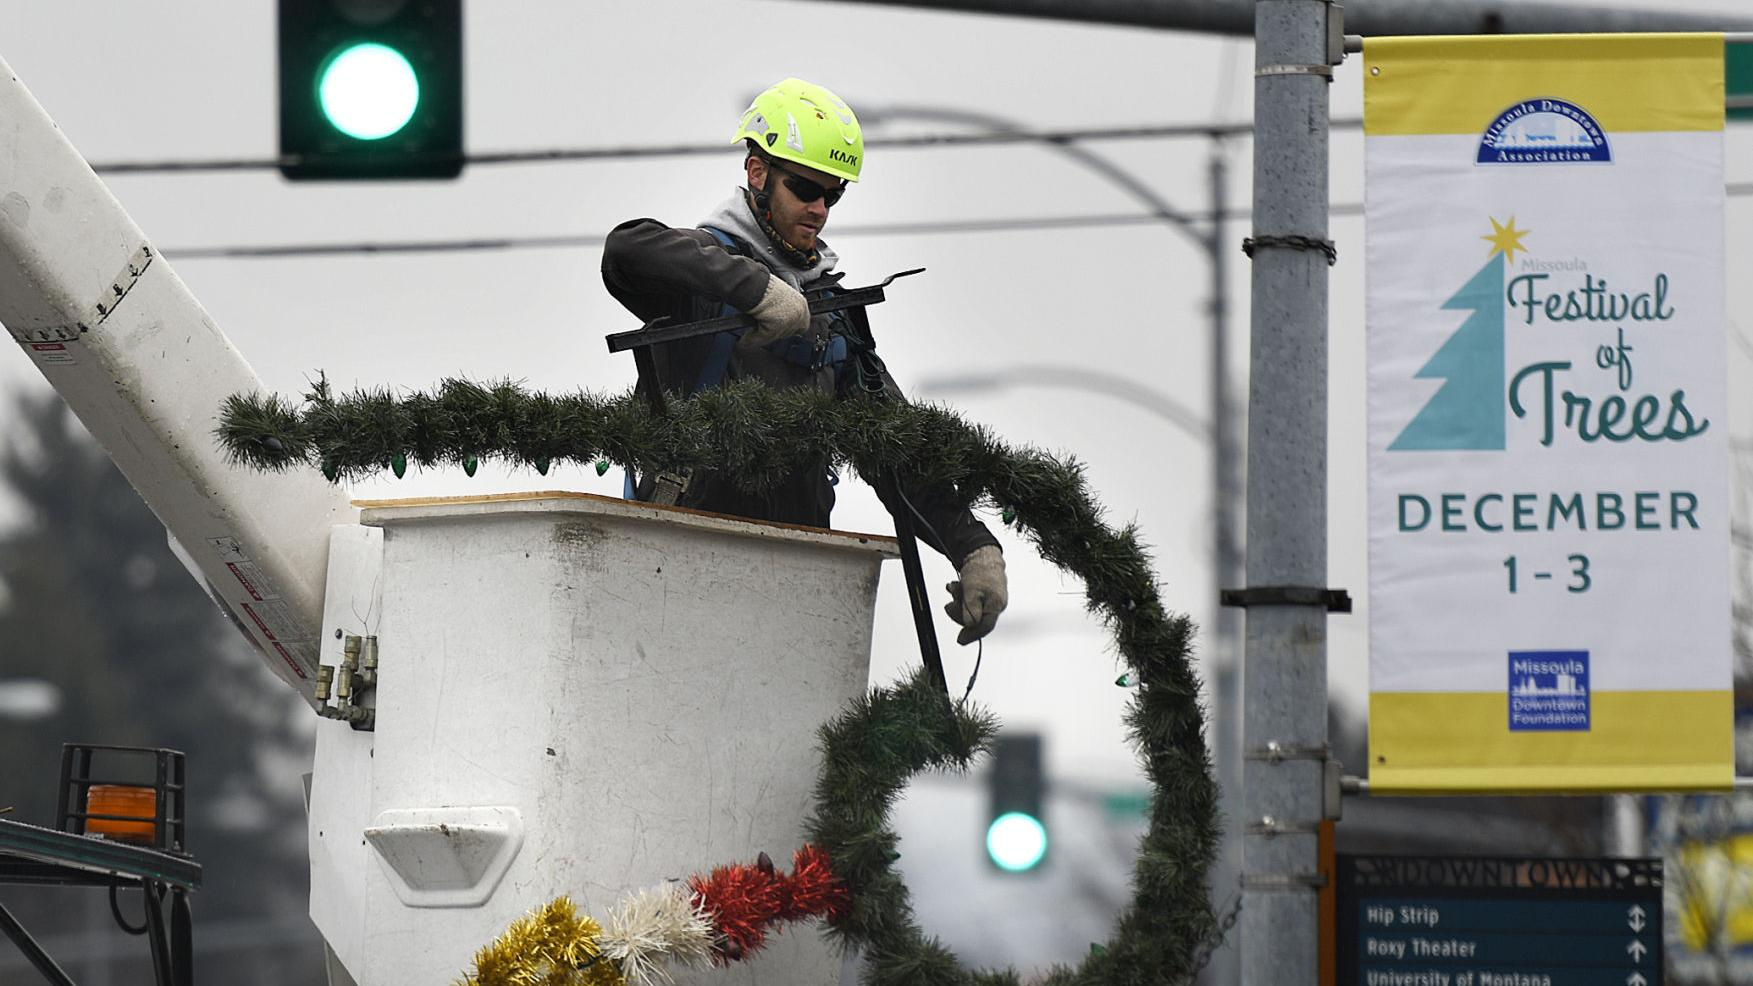 Christmas December Missoula 2020 Roxy Feature Photo: Christmas decorations go up across Missoula | Local